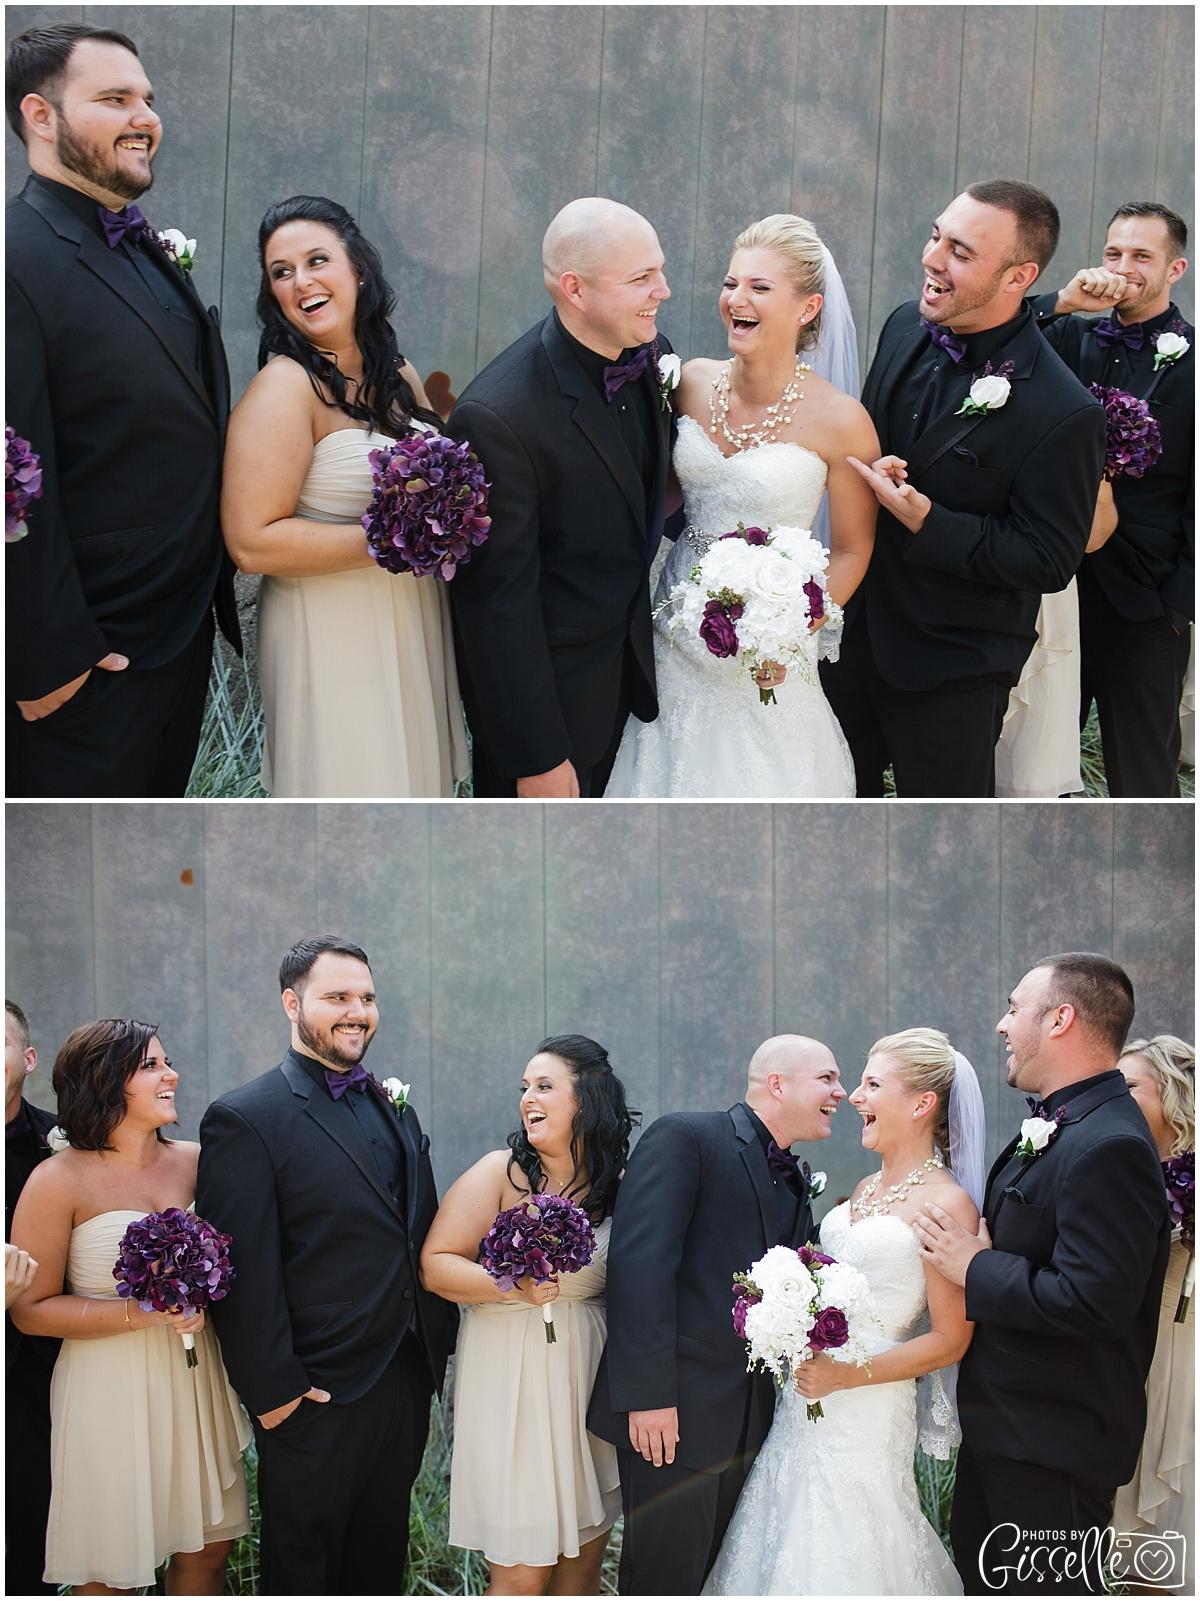 S_D_BLUMEN_GARDENS_WEDDING_PHOTOS_0029.jpg